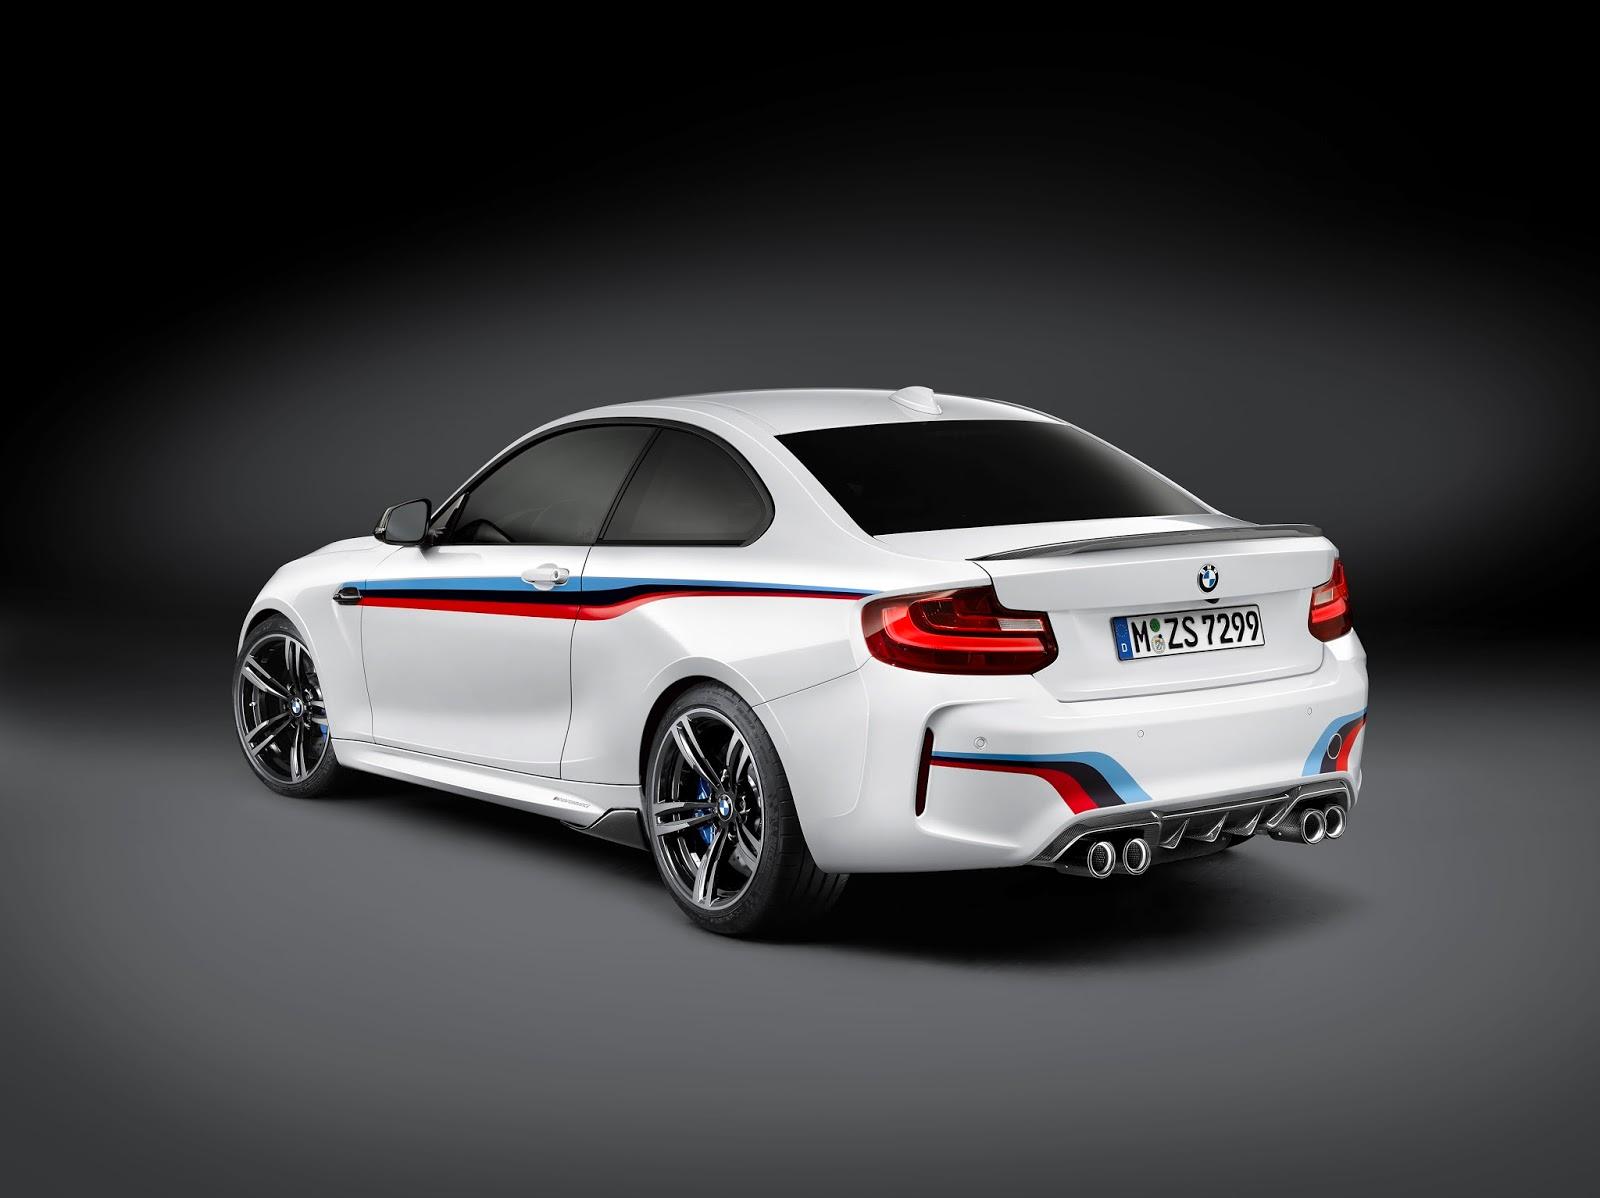 P90207894 highRes the new bmw m2 coupe Νέα Αξεσουάρ M Performance για τη νέα BMW M2 Coupé. BMW, BMW M2, BMW M2 Coupé, Αξεσουάρ